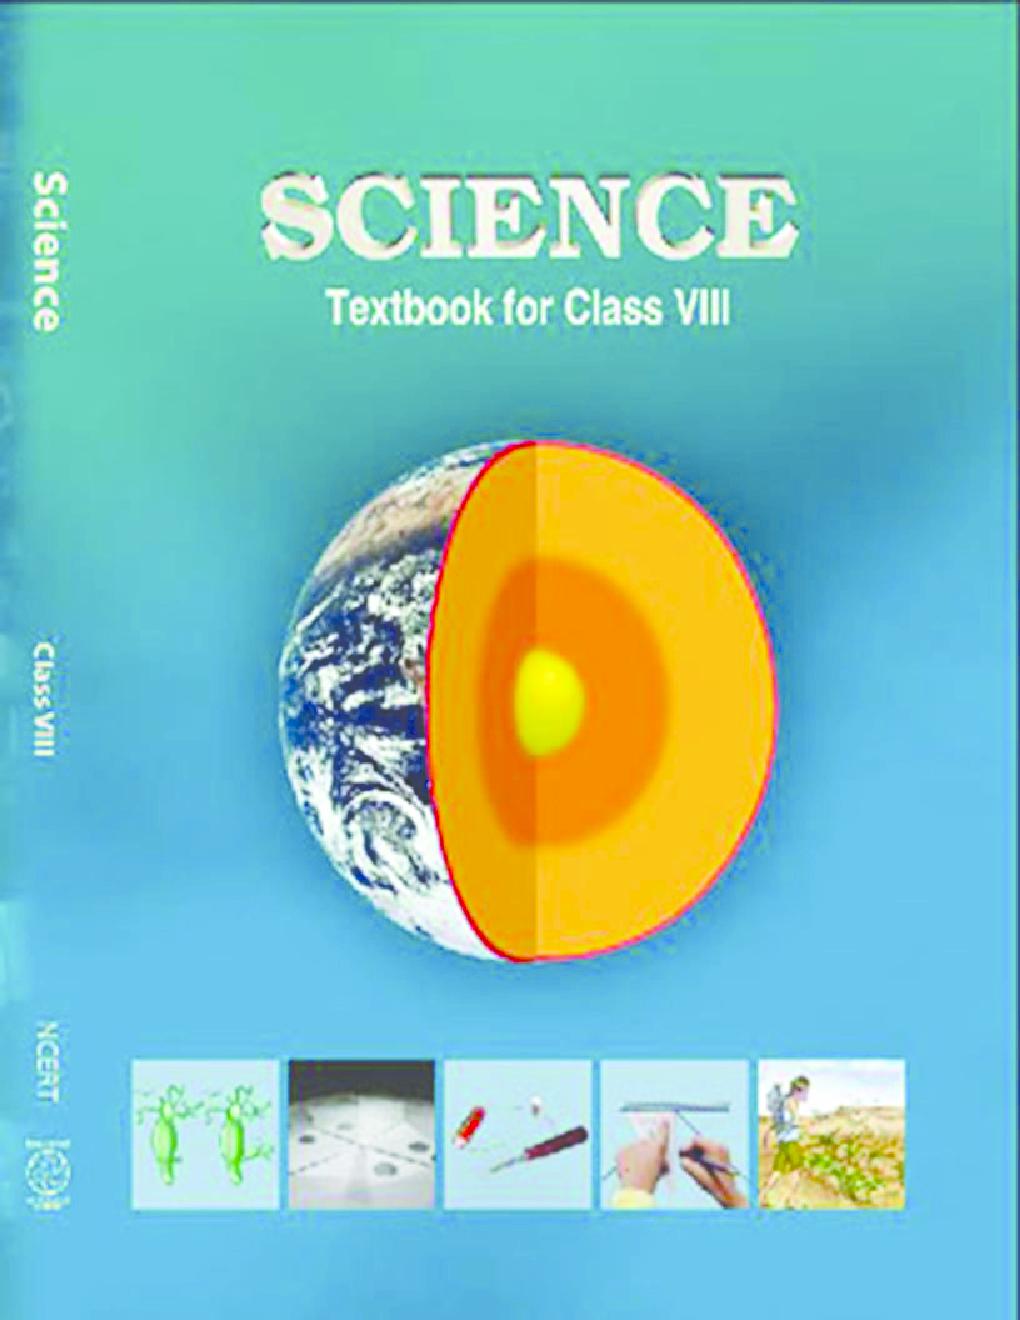 Ncert books 2005 free download - www sandtitonetela info